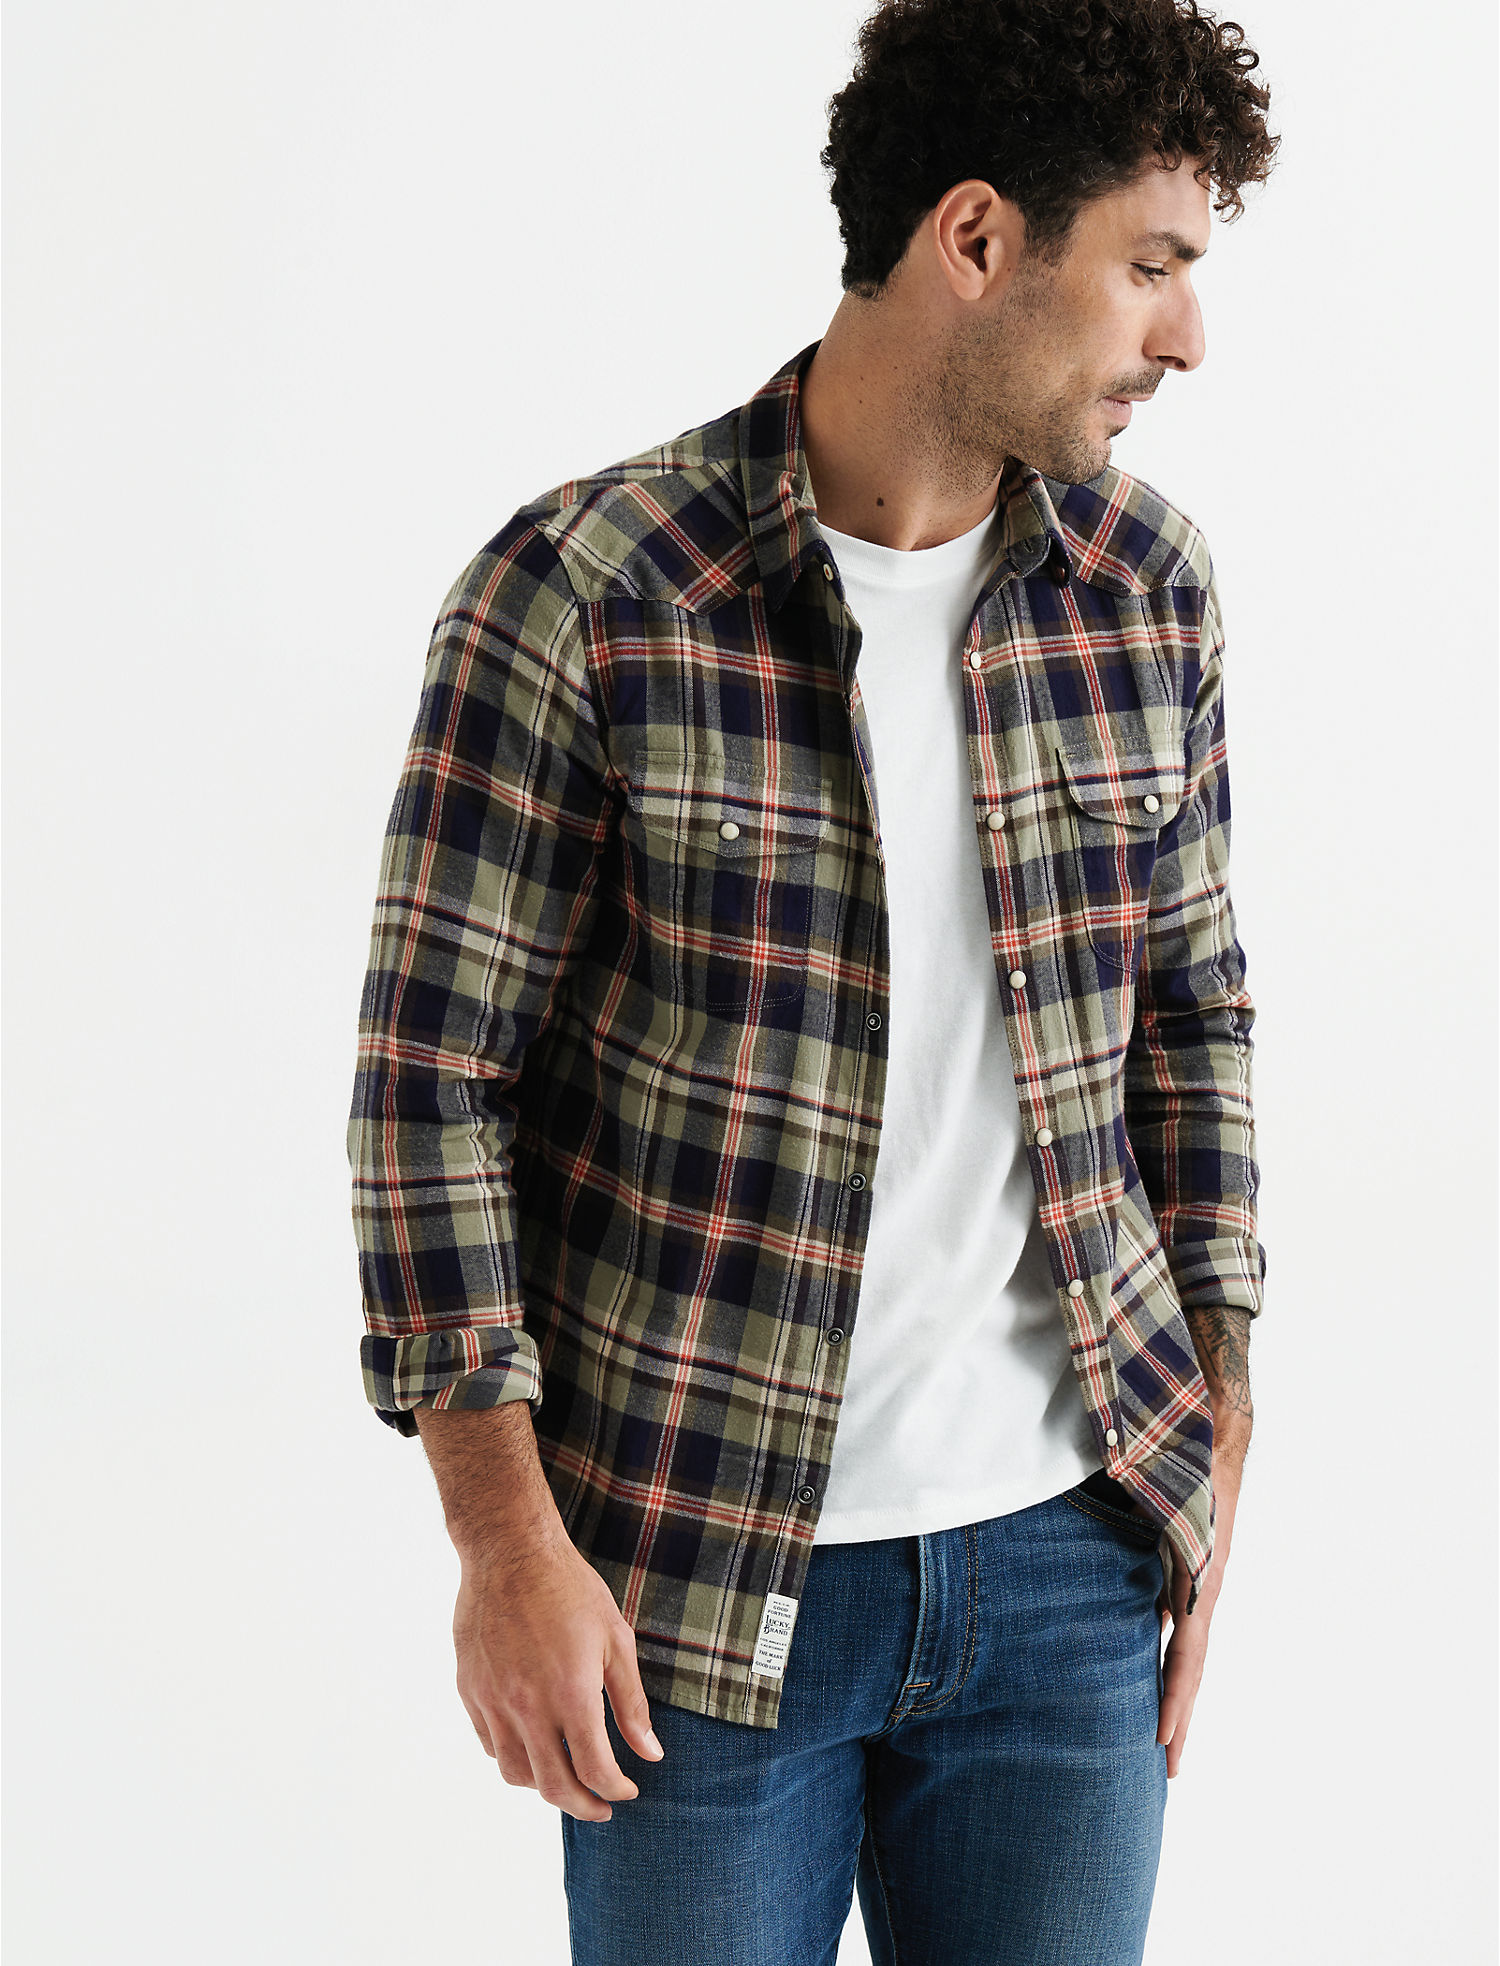 4e6daea0e6 Lucky Brand Mens Long Sleeve Santa Fe Western Shirt L Olive Plaid